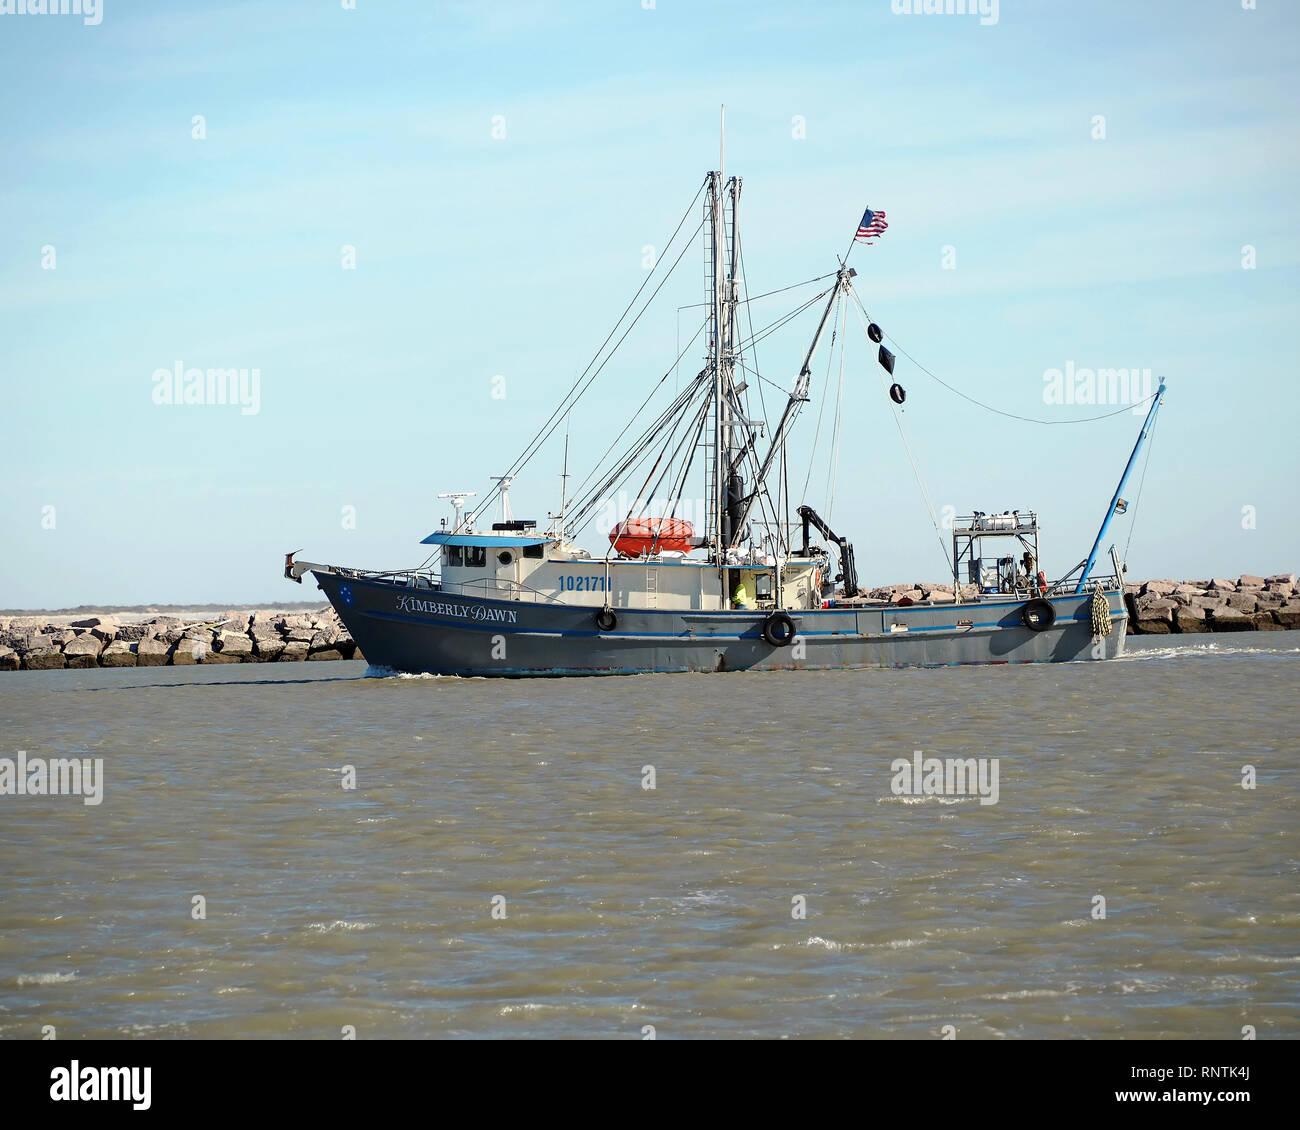 "The shrimp boat, "" Kimberly Dawn,"" passes through the Corpus Christi Ship Channel near the north jetty in Port Aransas, Texas USA. Stock Photo"